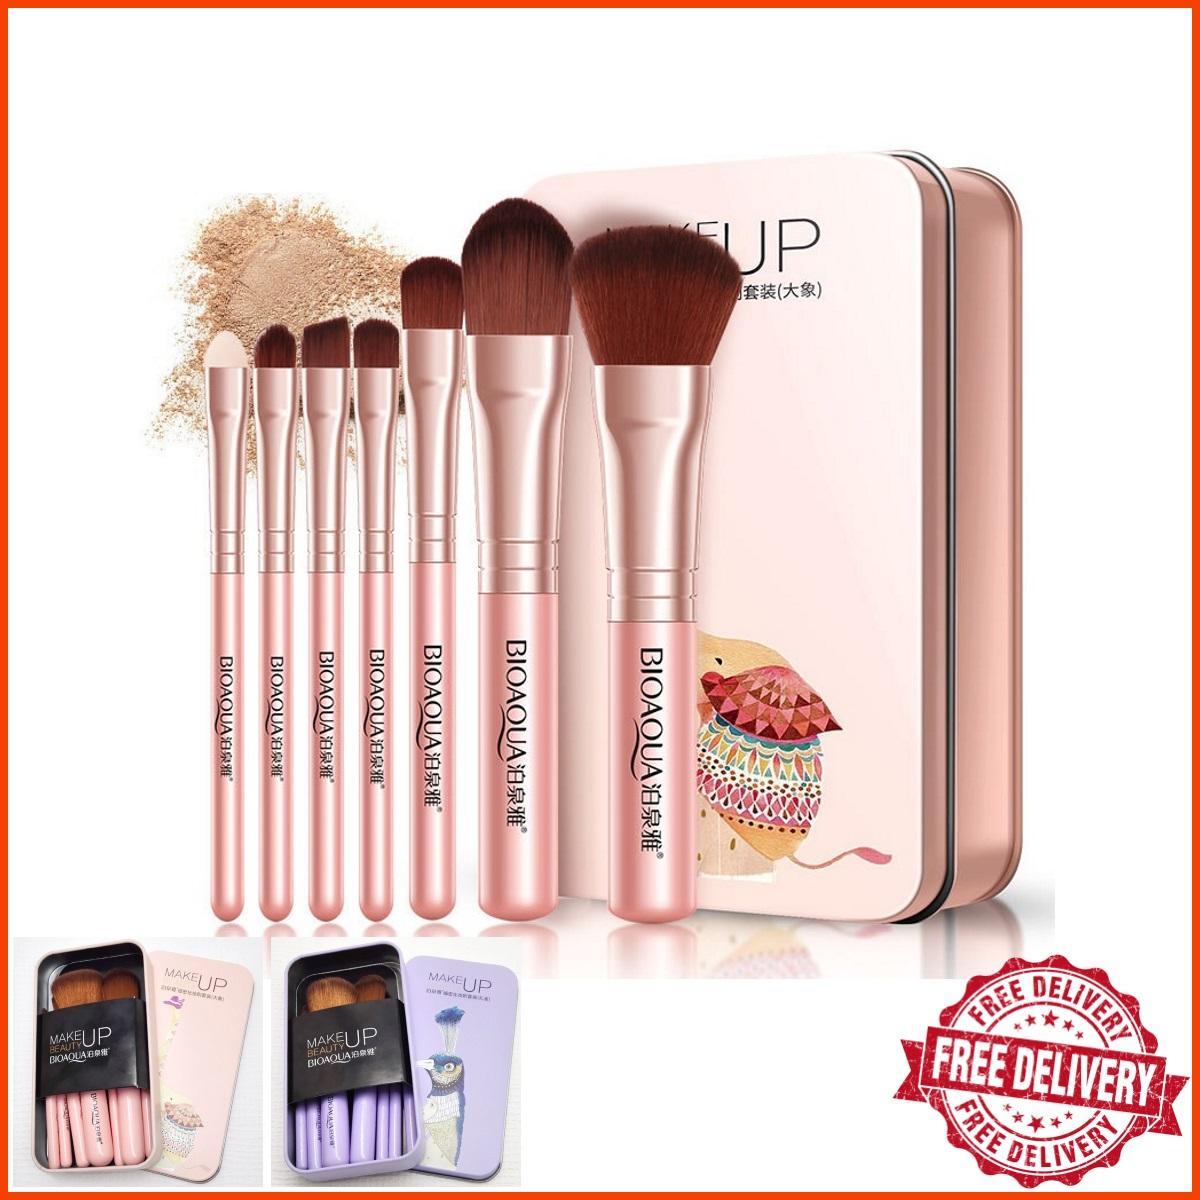 Buy Makeup Brushes Applicators Online Kuas Mascara Brush Naked Set 7 Pcs Synthetic Fiber With Soft Airy Bristles Styluscious